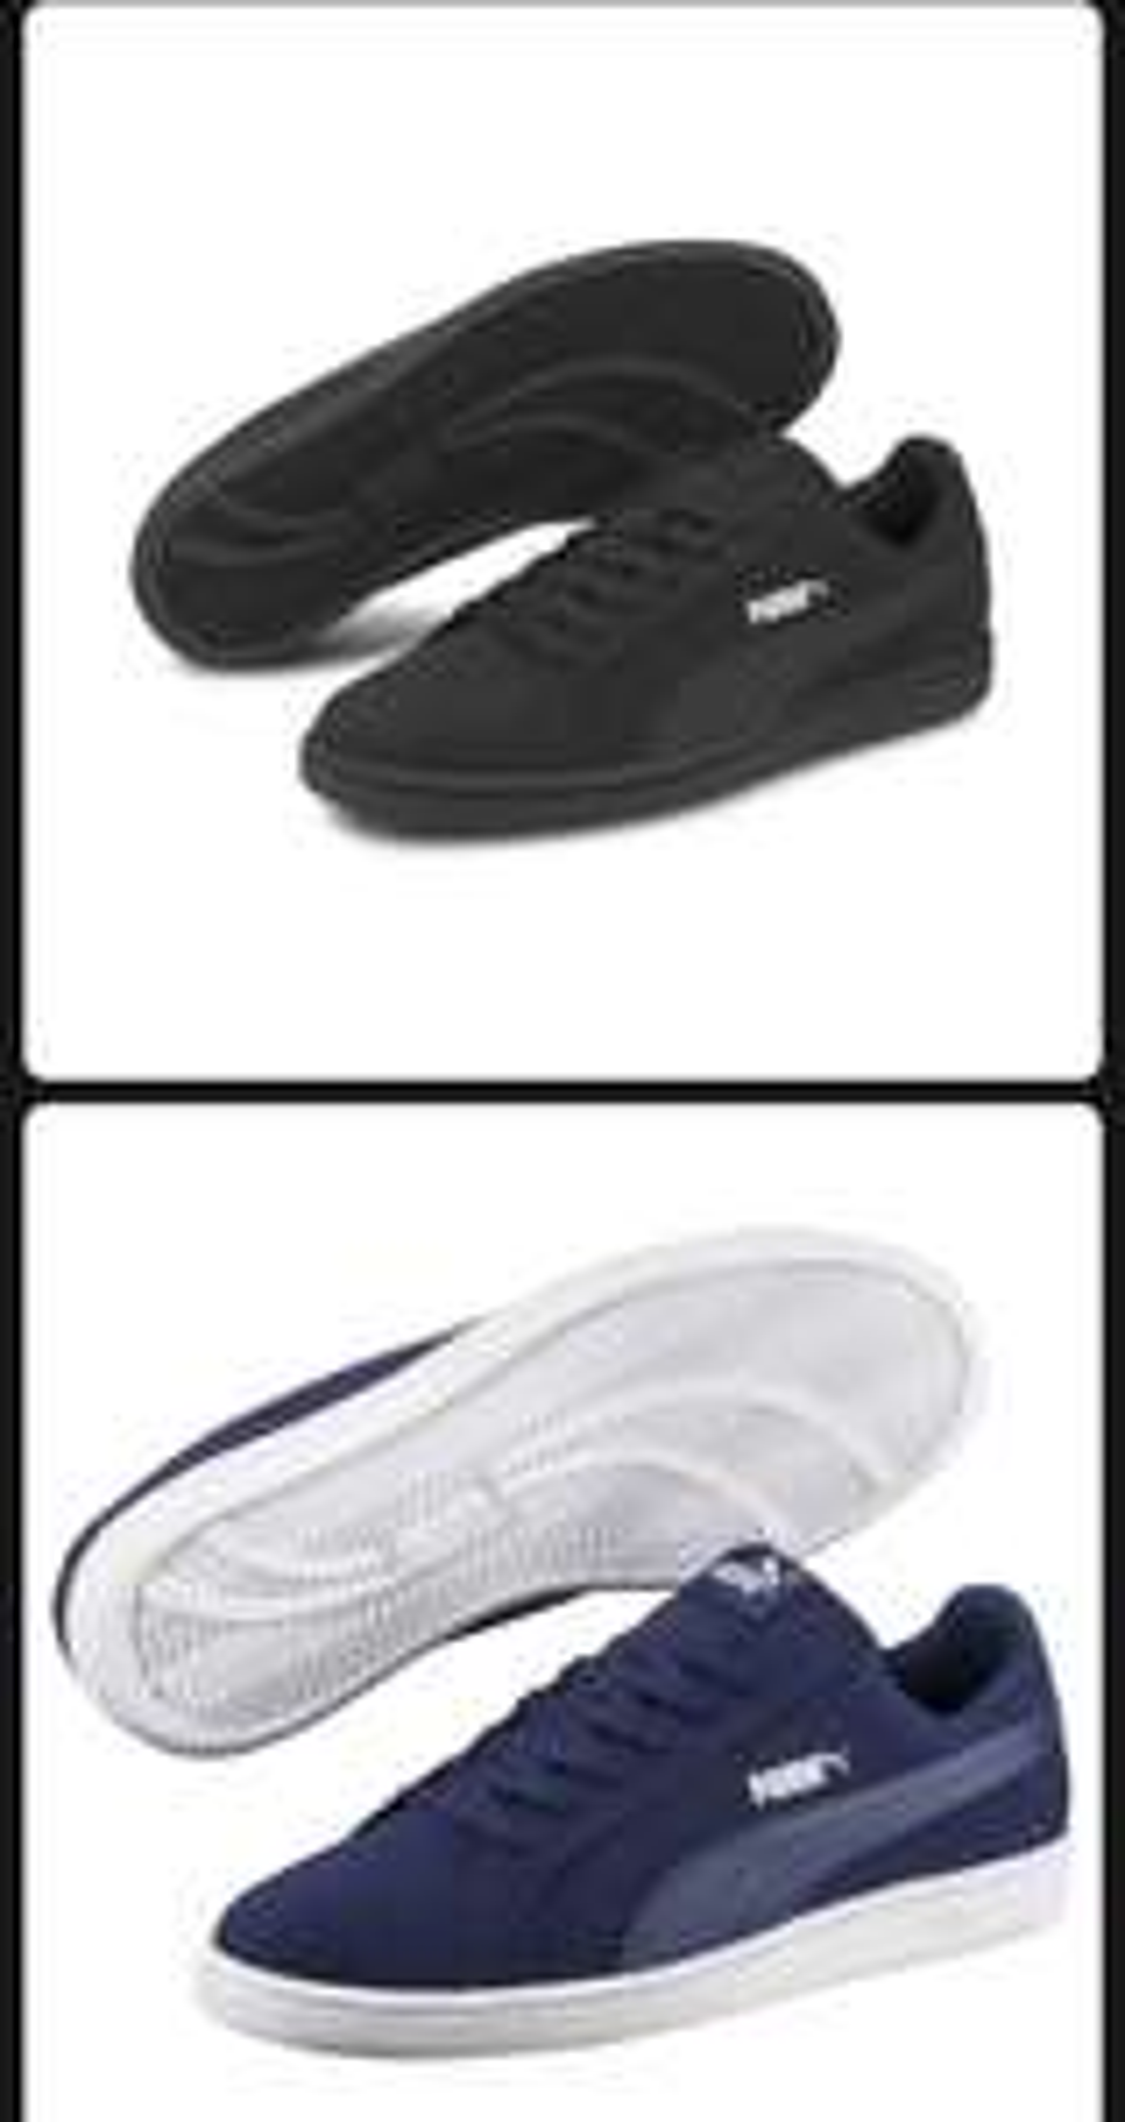 PUMA Smash Buck Sneaker Unisex Schuhe Sport Classics Neu (Kunstleder)